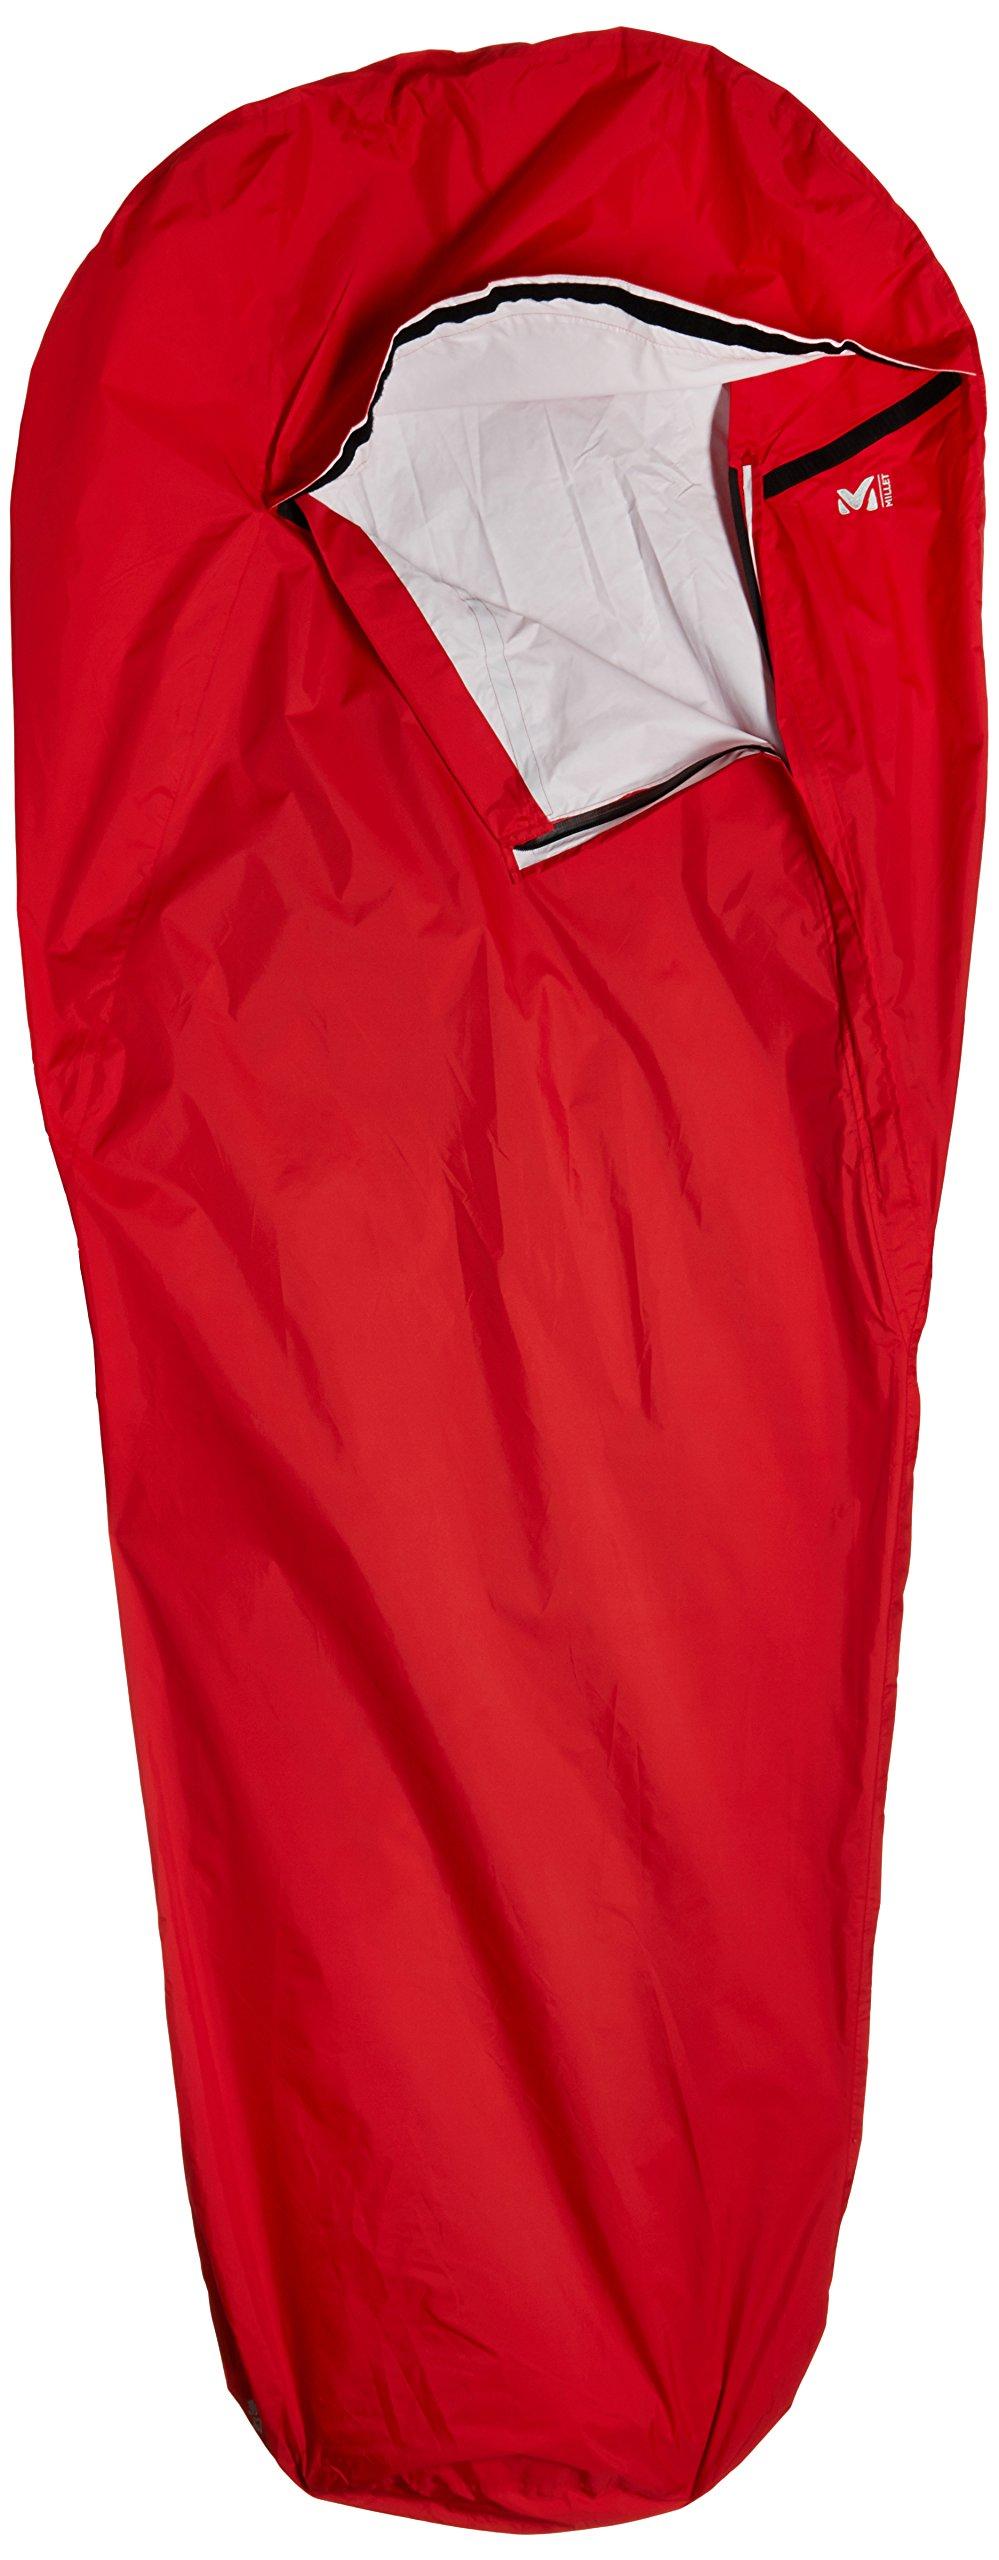 Millet Bivy Bag Red, One Size